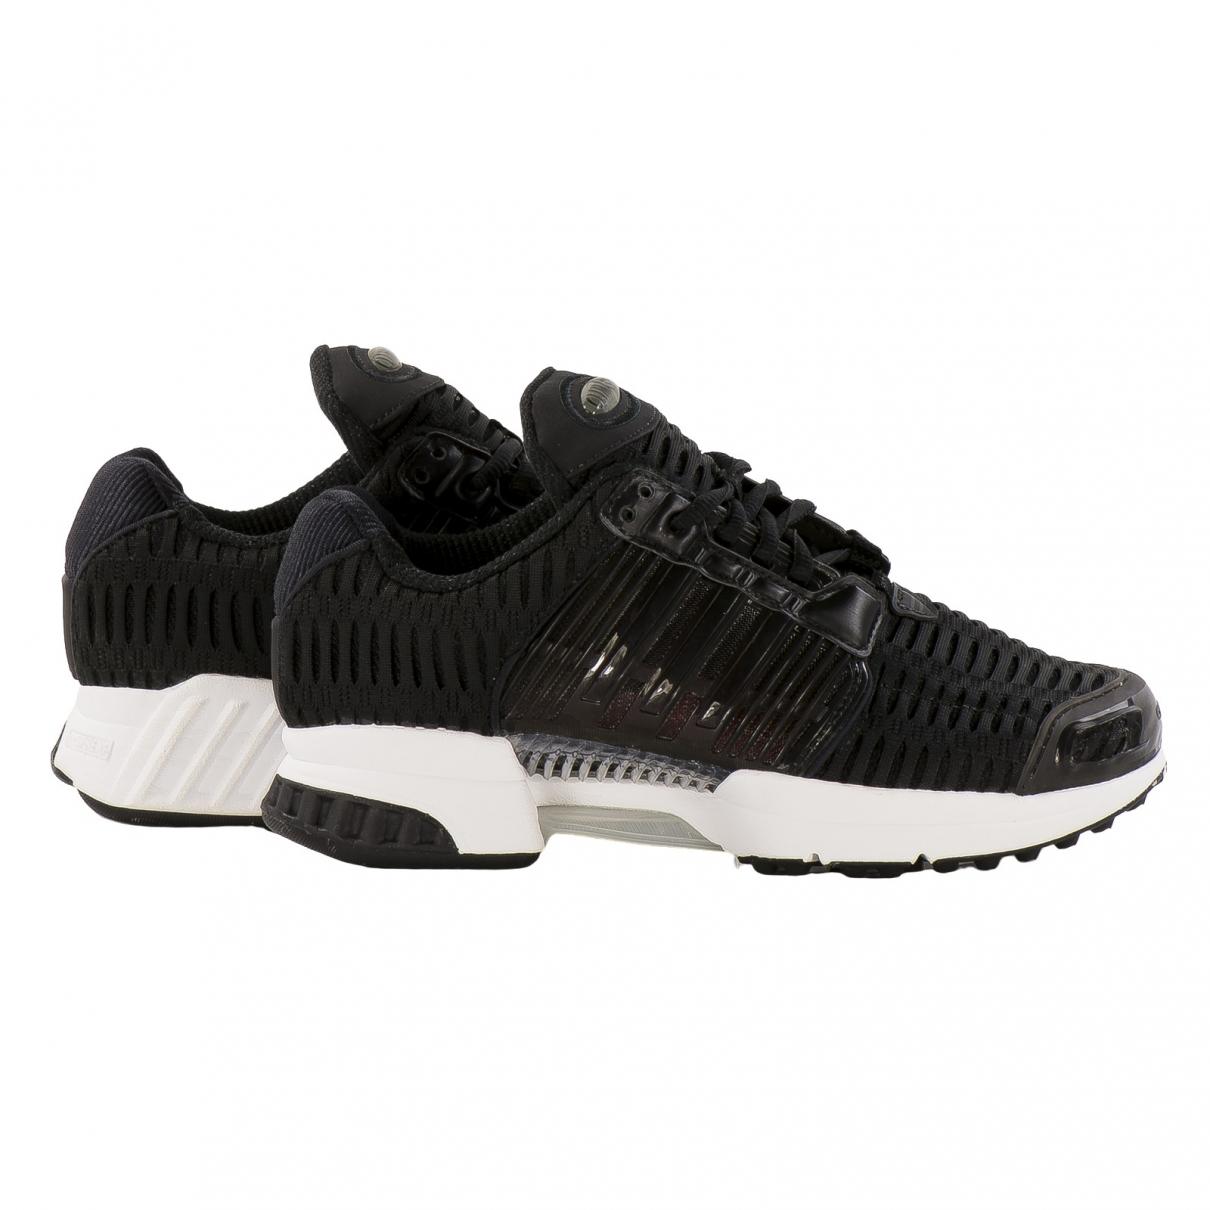 Adidas \N Black Cloth Trainers for Women 36.5 EU